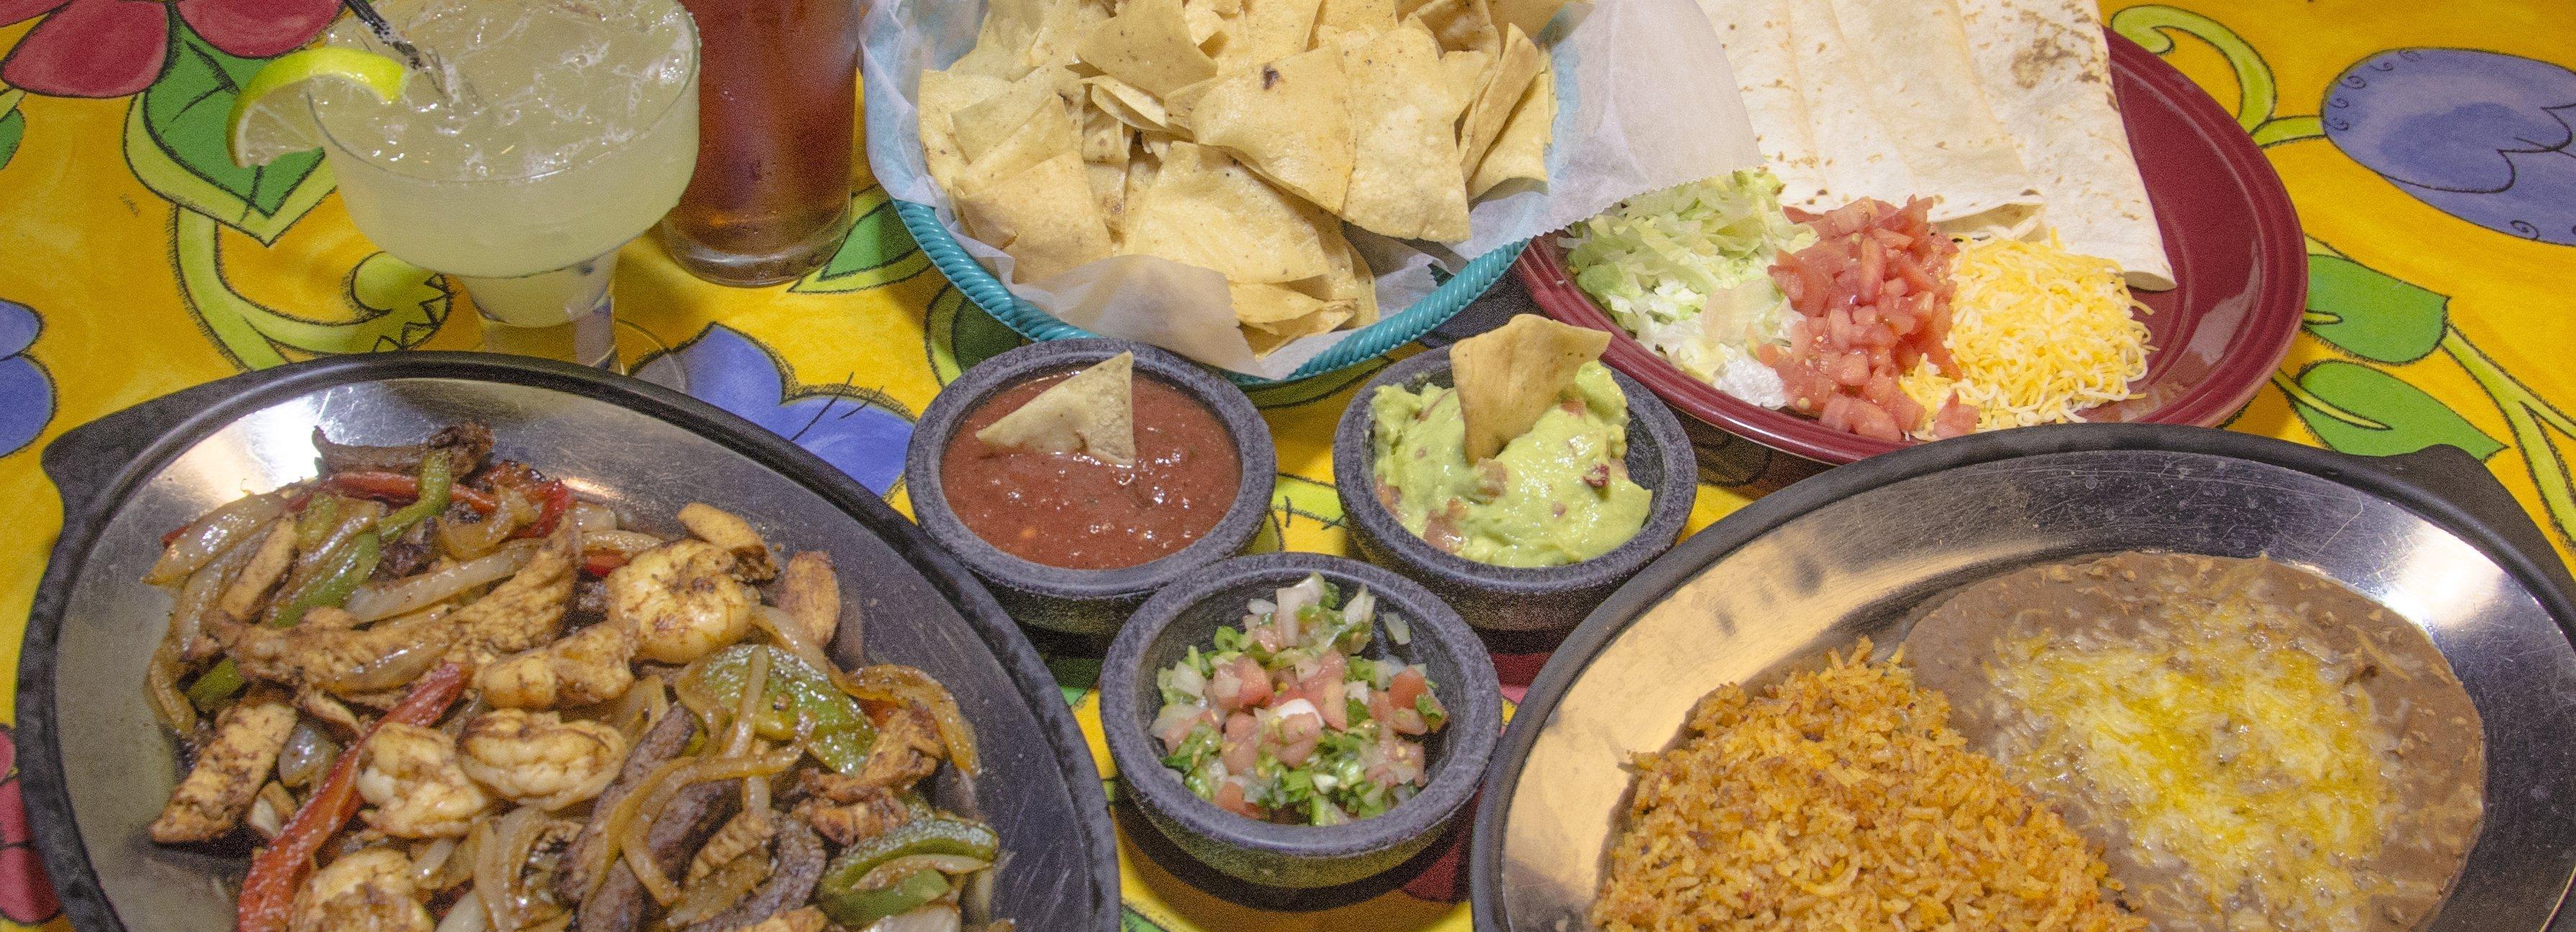 Tia Helitas Mexican Cuisine in Flint, Michigan